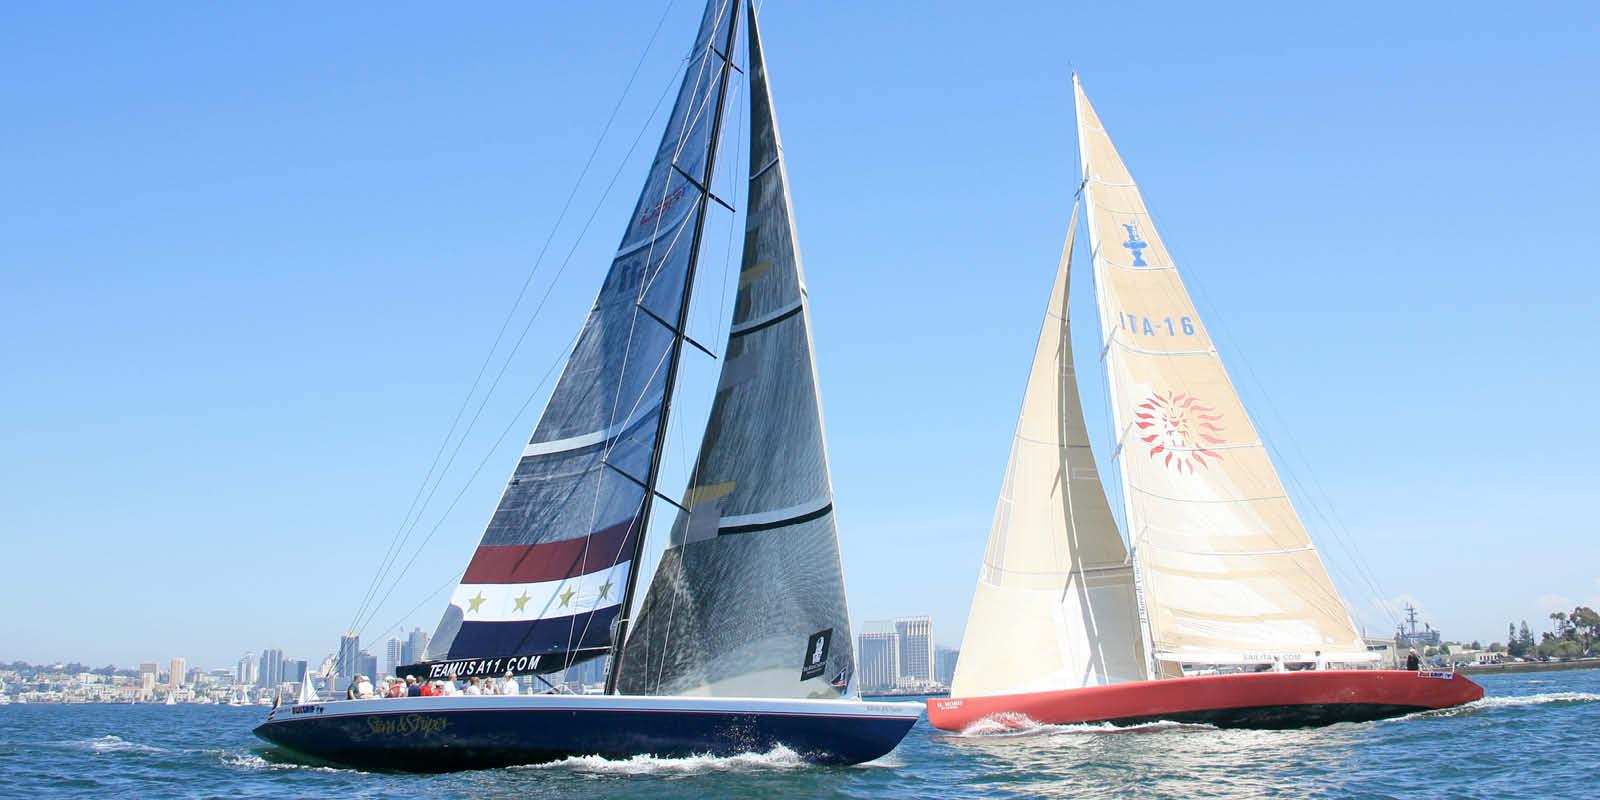 Sailboats on San Diego Bay